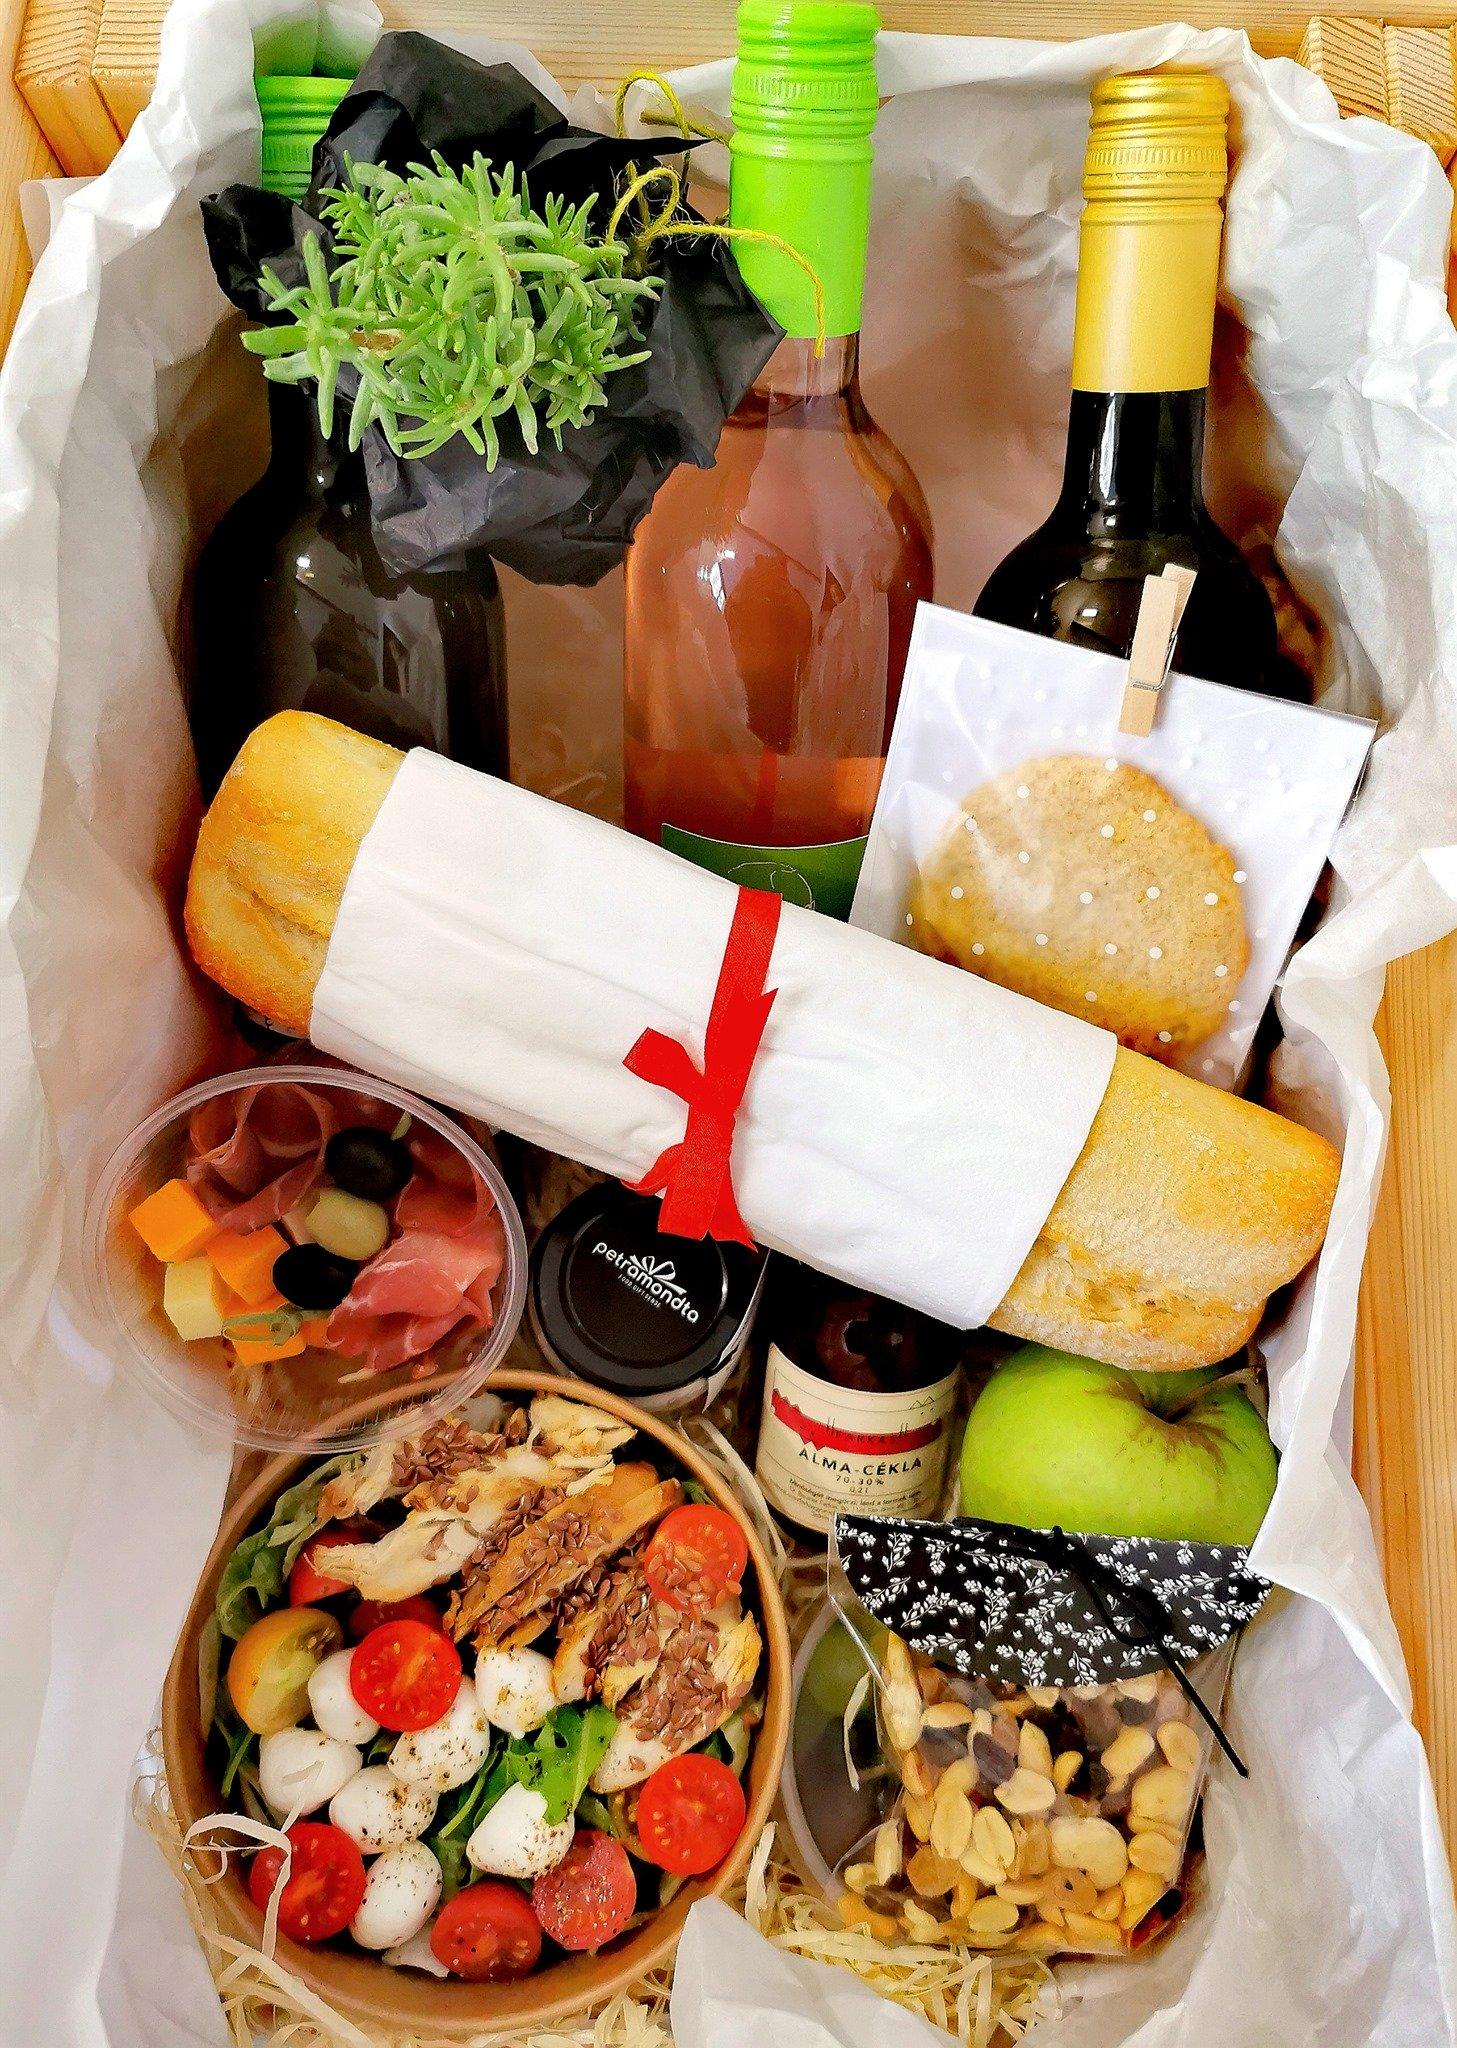 Petramondta piknikkosár